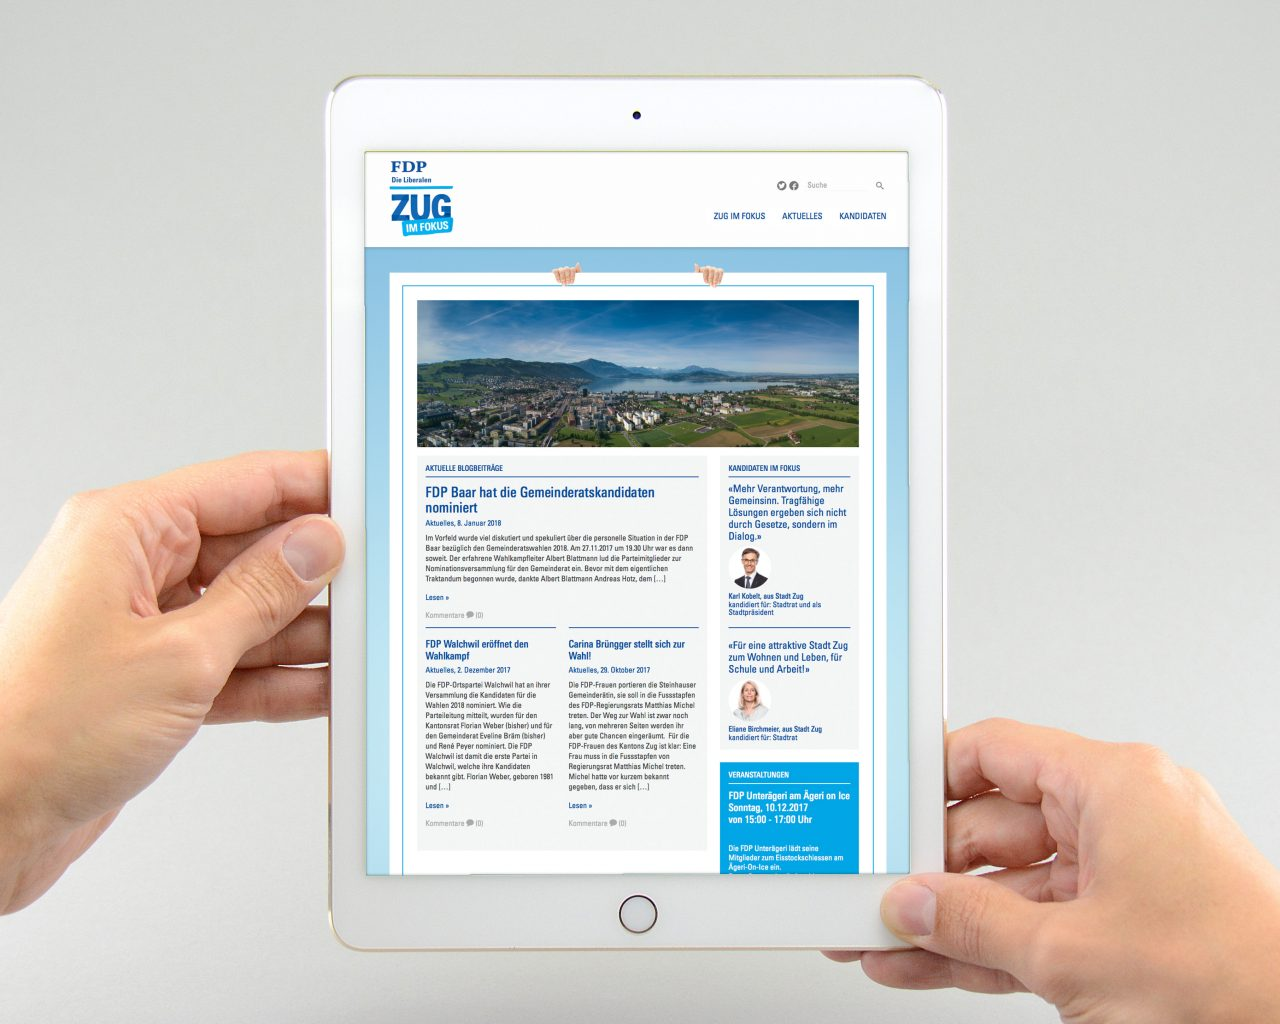 FDP_Wahlkampf_Website